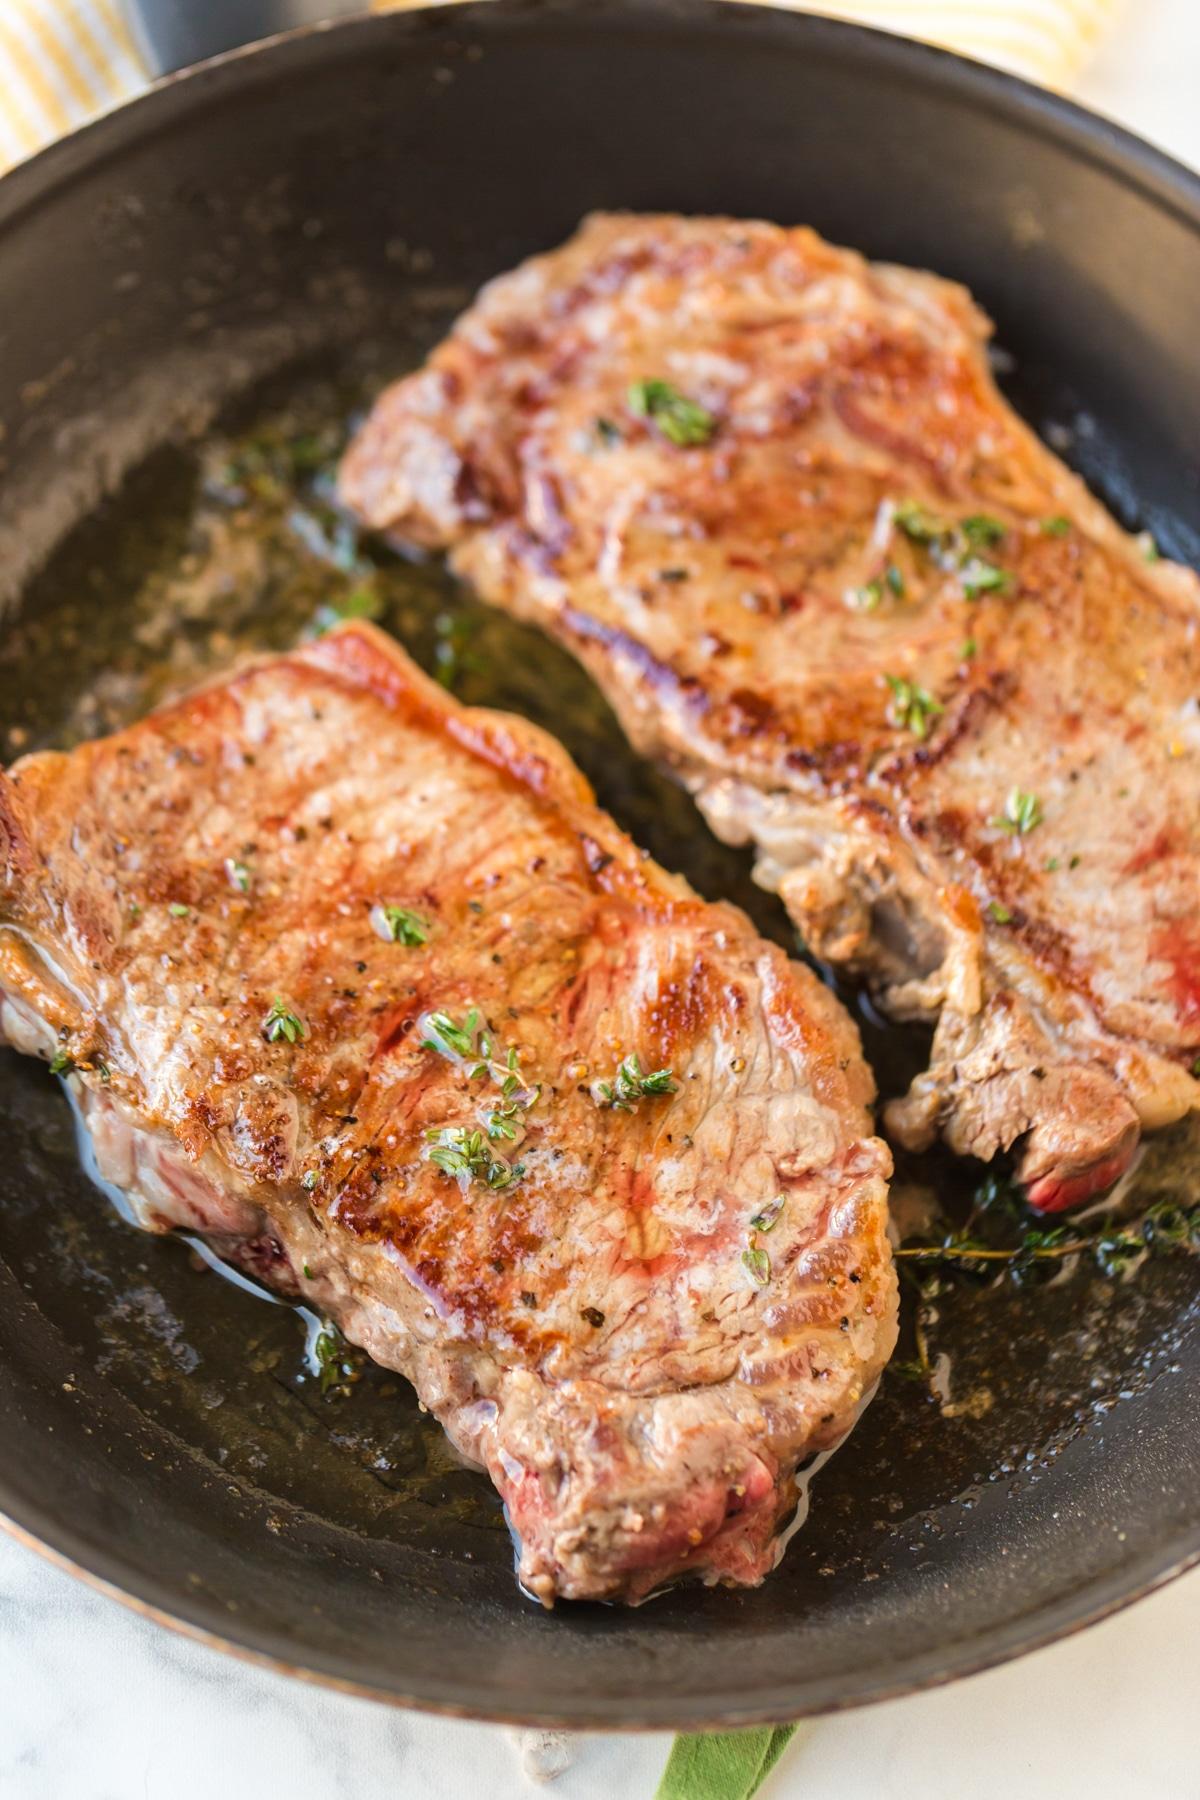 How to Make Easy Beef Stroganoff Recipe with Butter Noodles Recipe #ASpicyPerspective #beef #stroganoff